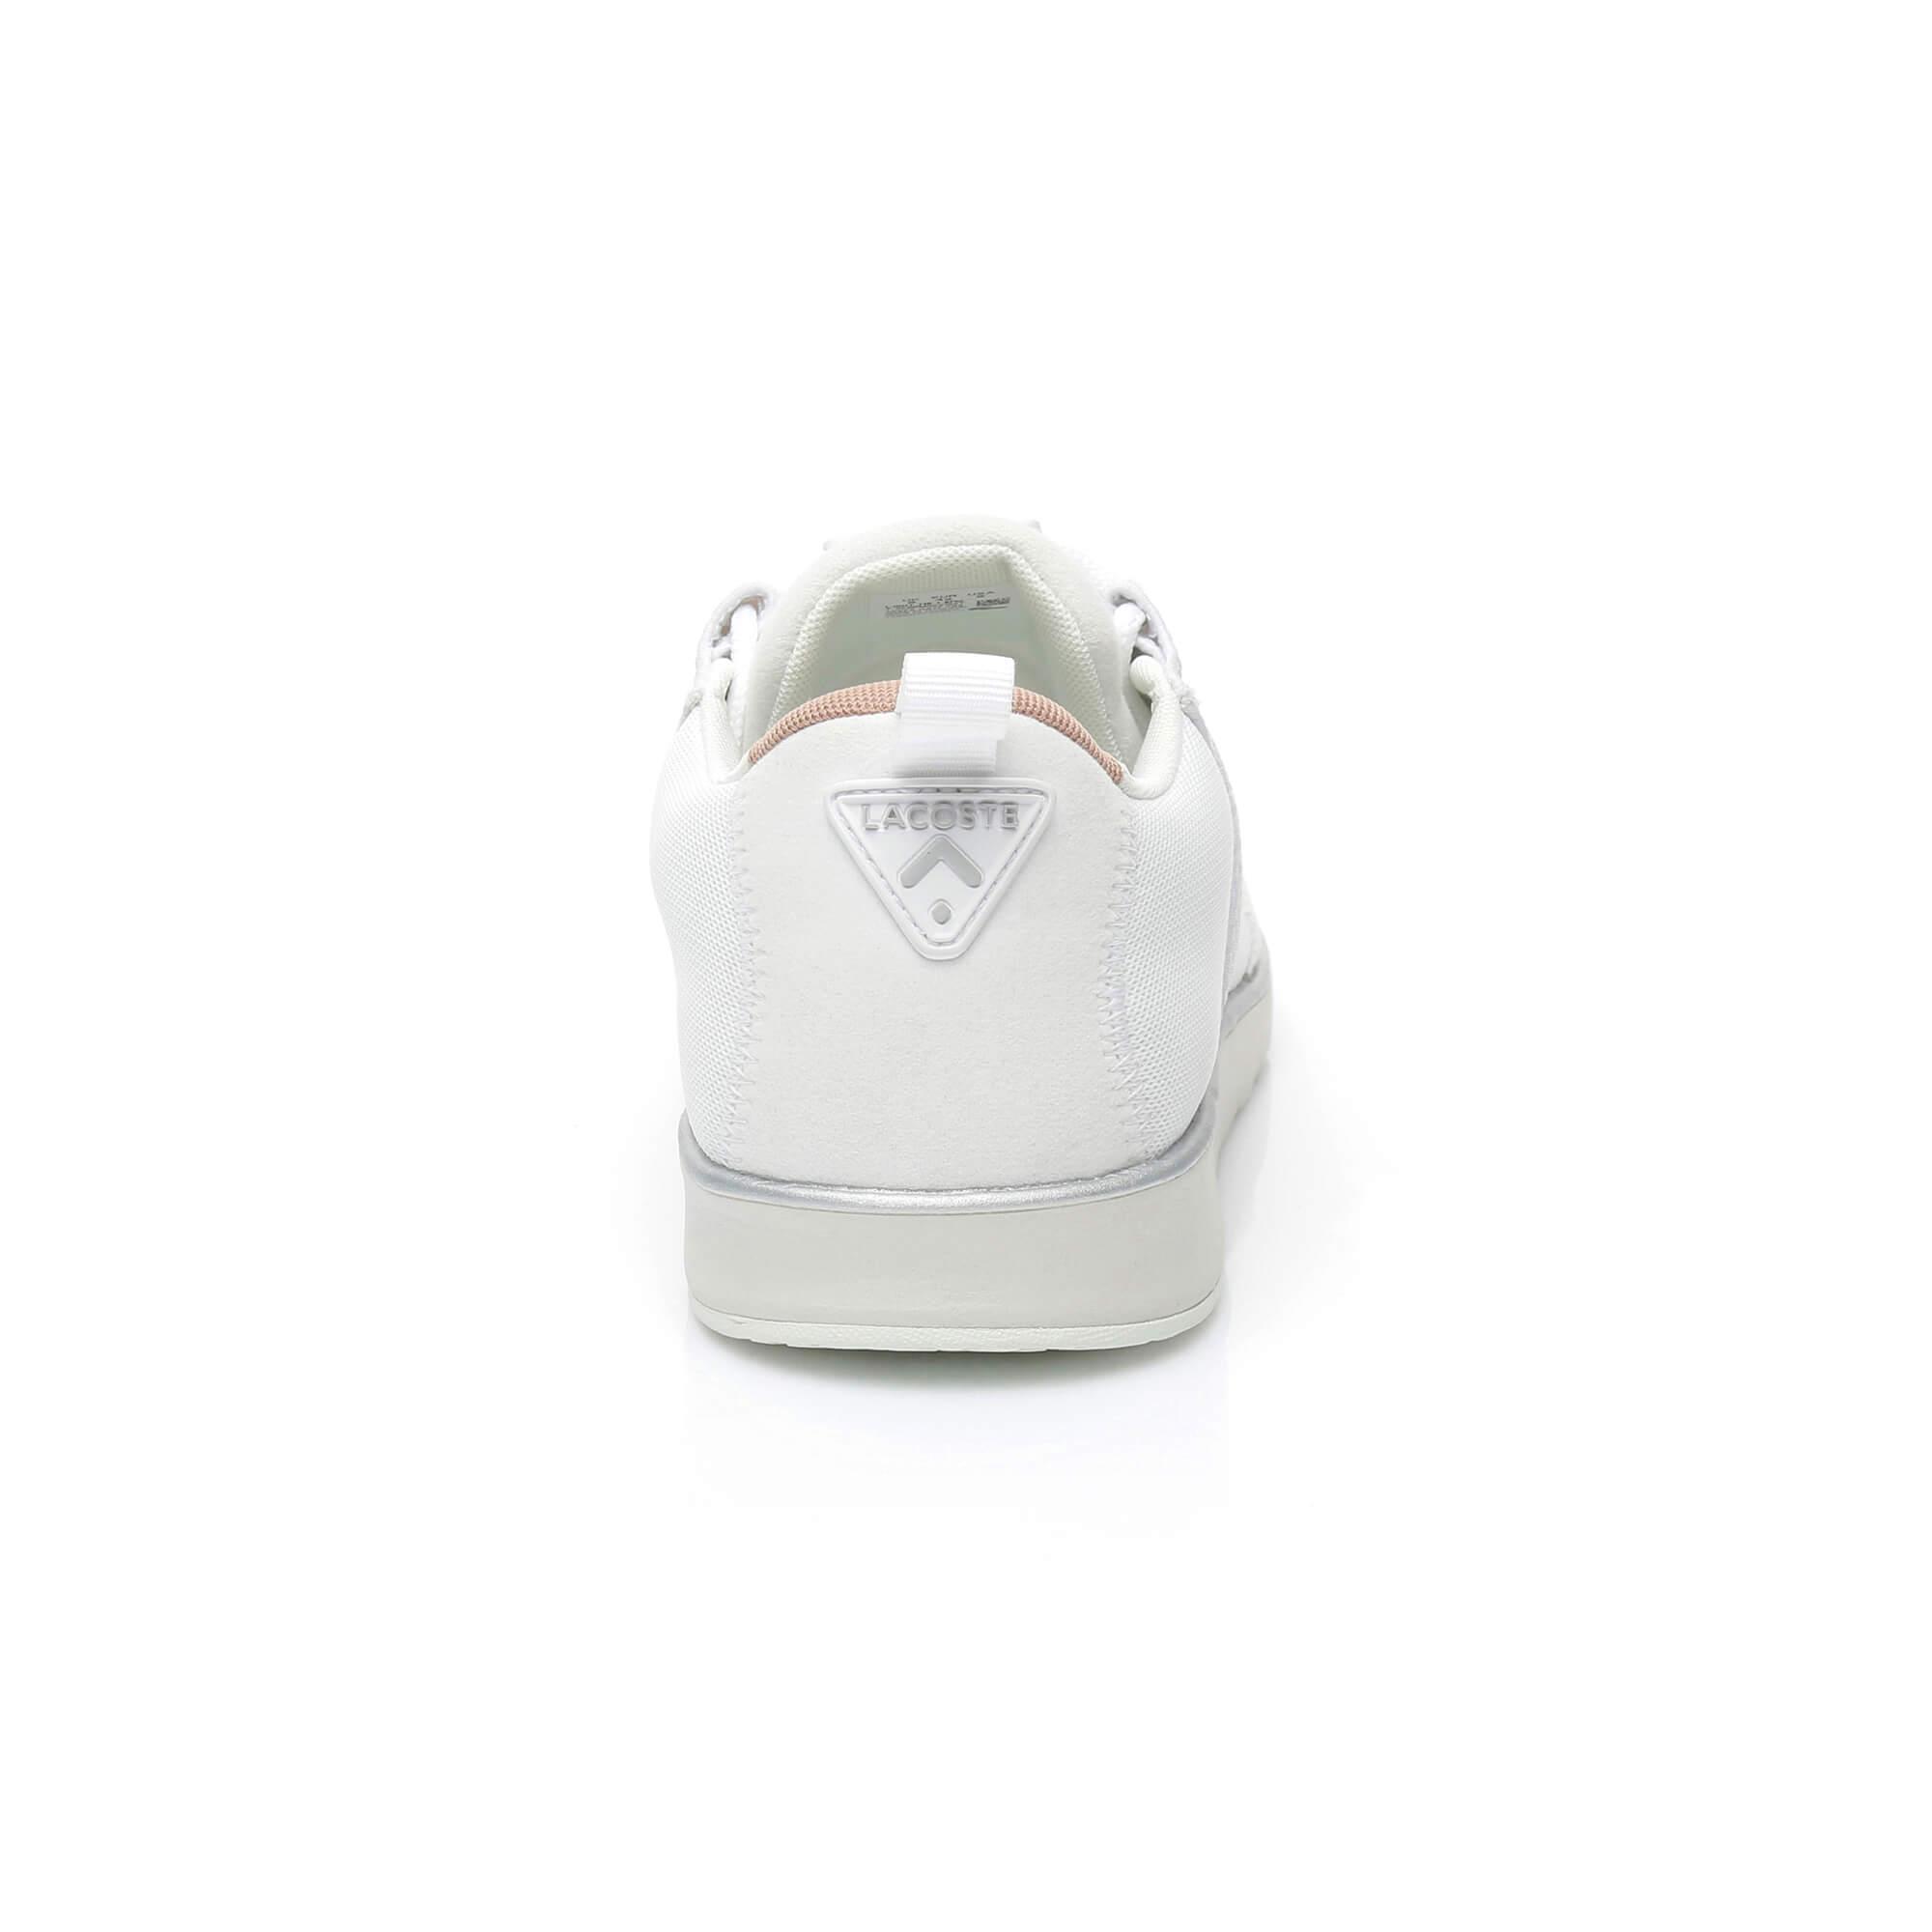 Lacoste Light Erkek Sneaker